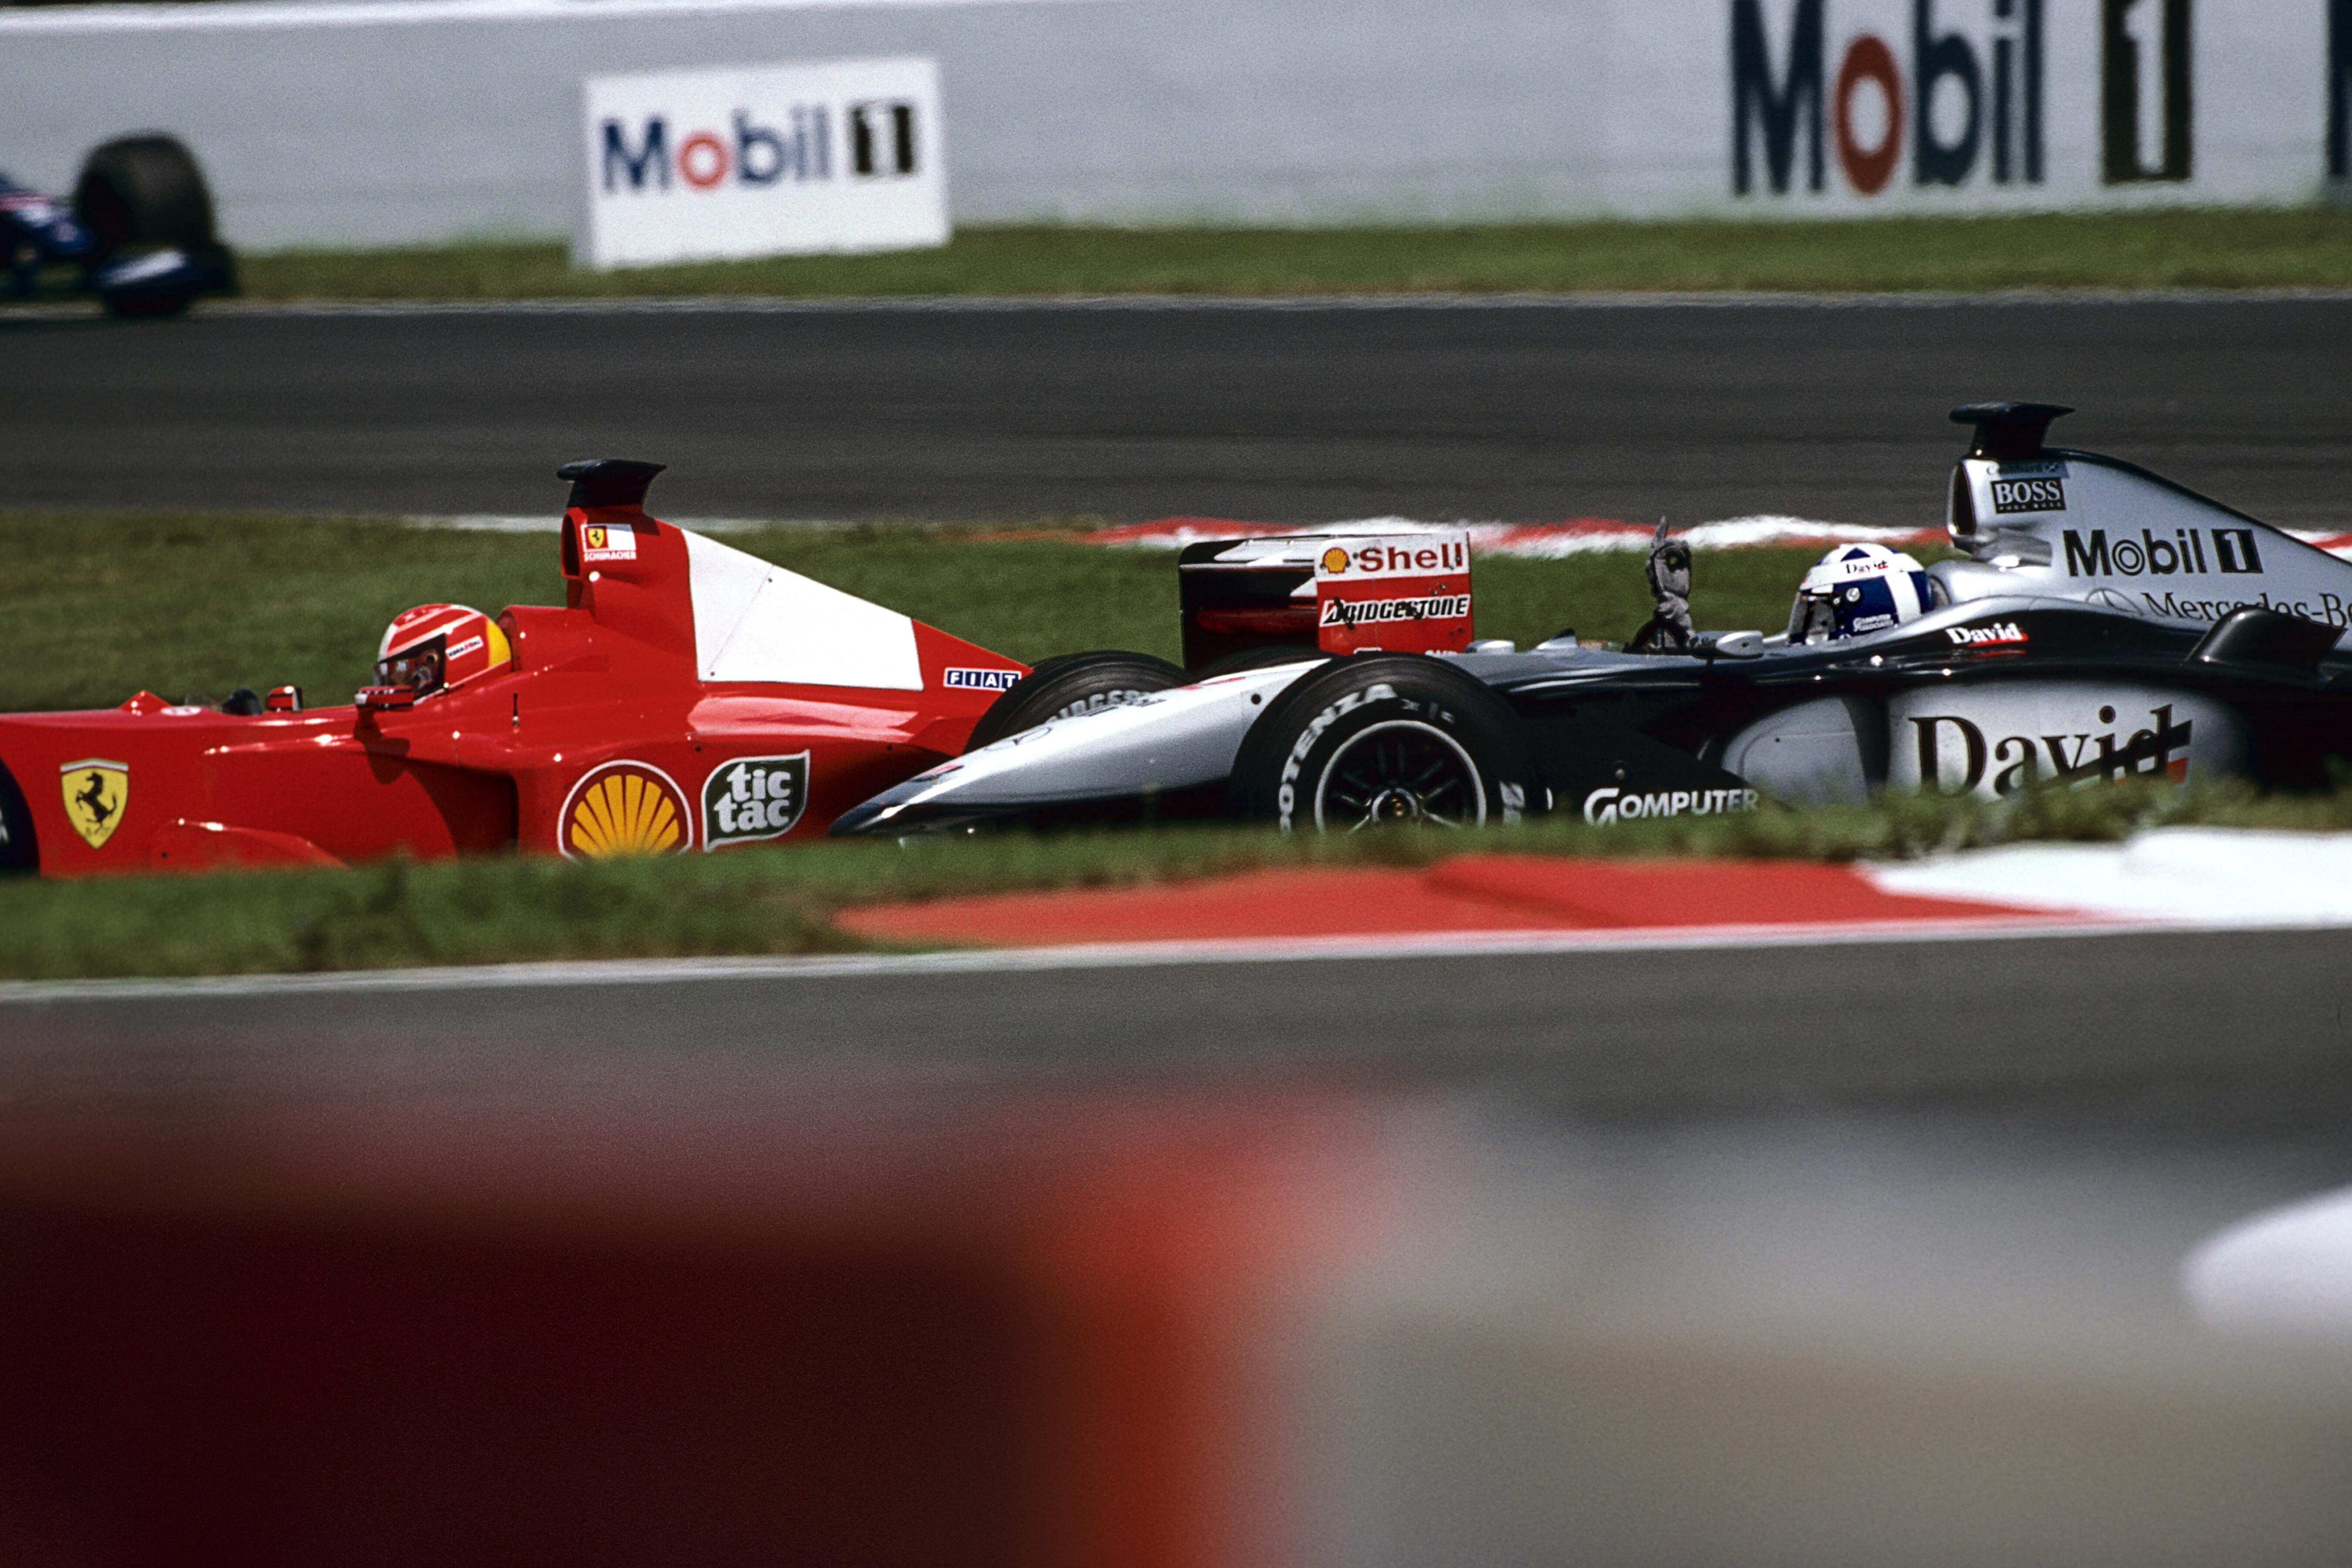 David Coulthard Michael Schumacher flipping the bird